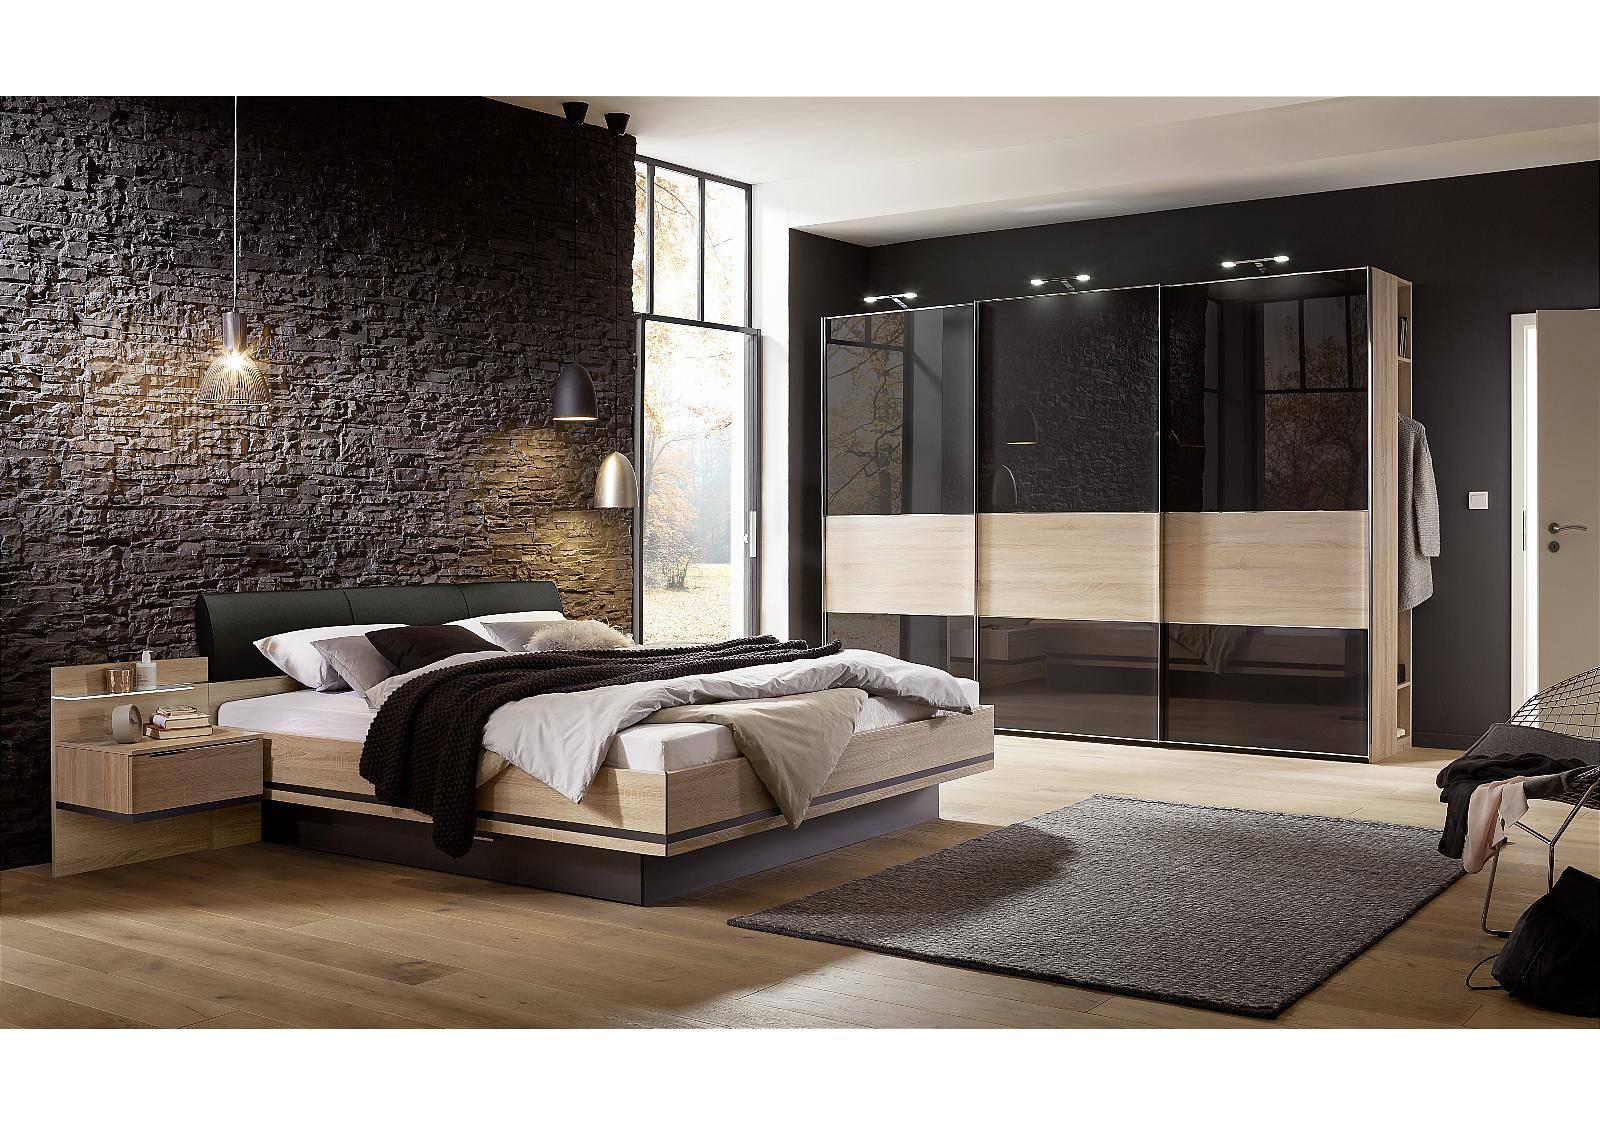 Nolte Marcato 2 0 Bedroom Range Vale Furnishers